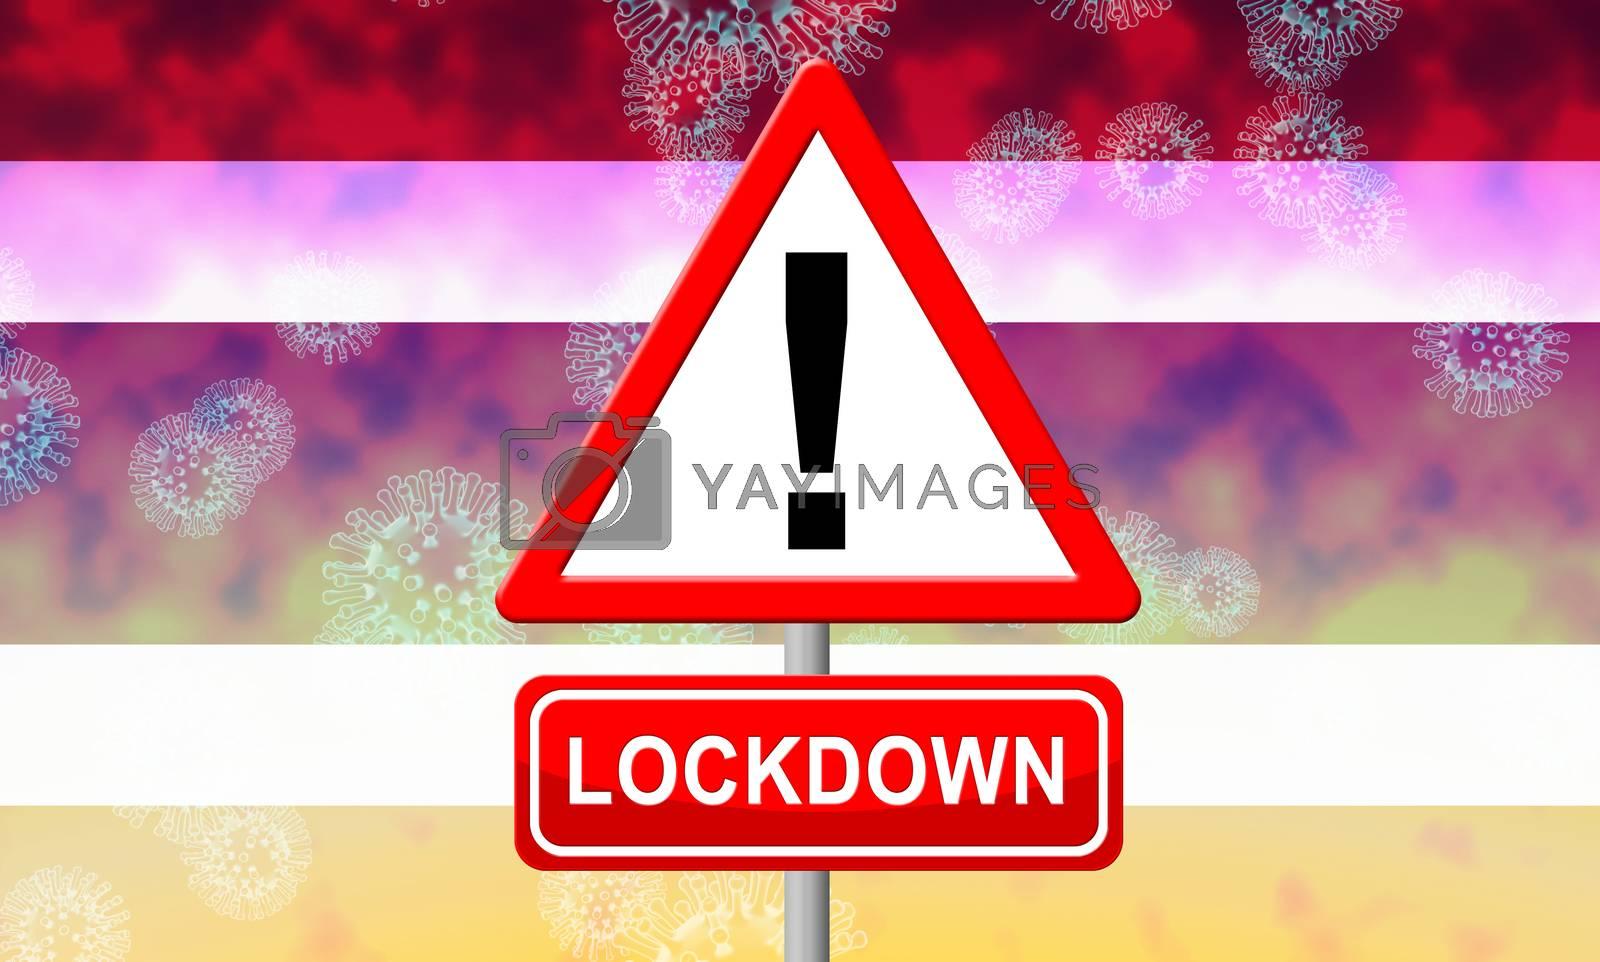 Thailand lockdown or shutdown for ncov epidemic. Covid 19 Thai precaution to isolate disease infection - 3d Illustration